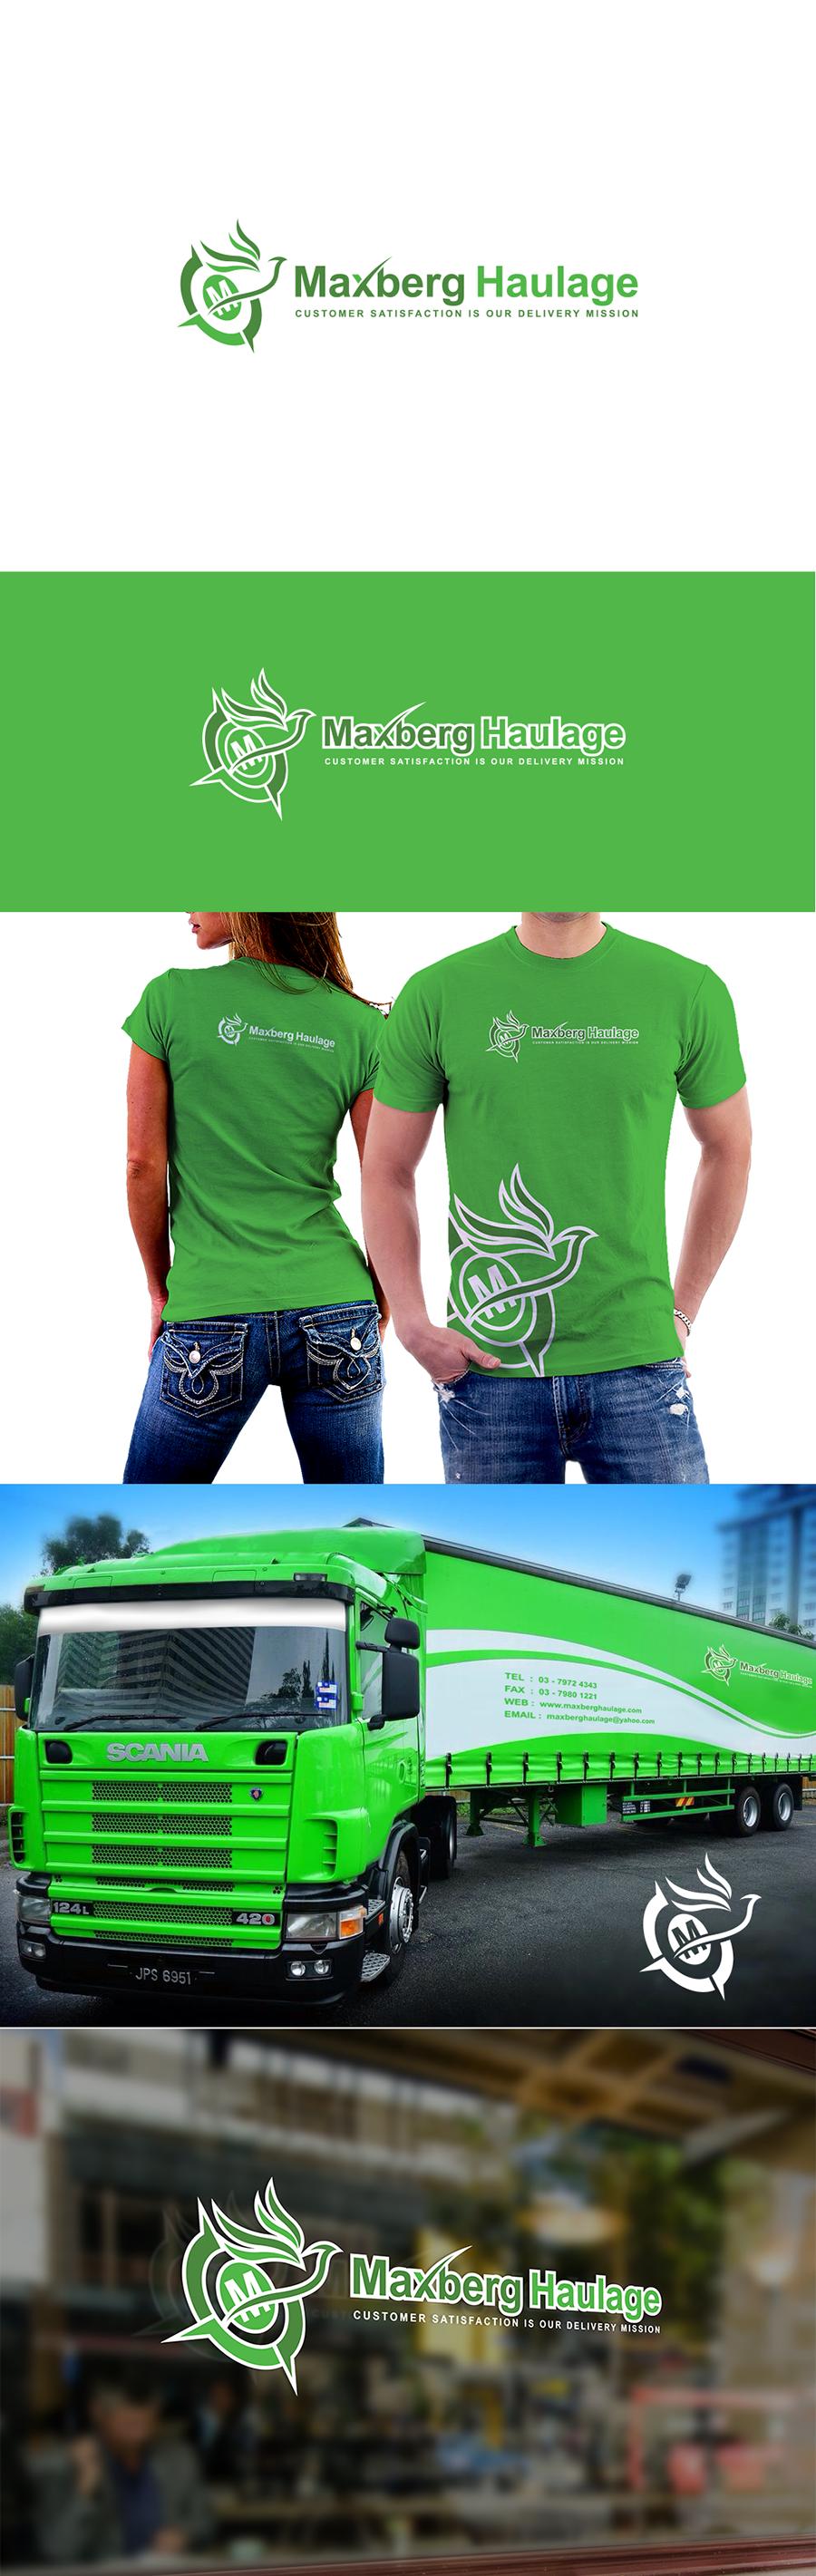 Creative Logo for Transport Company (Haulage)